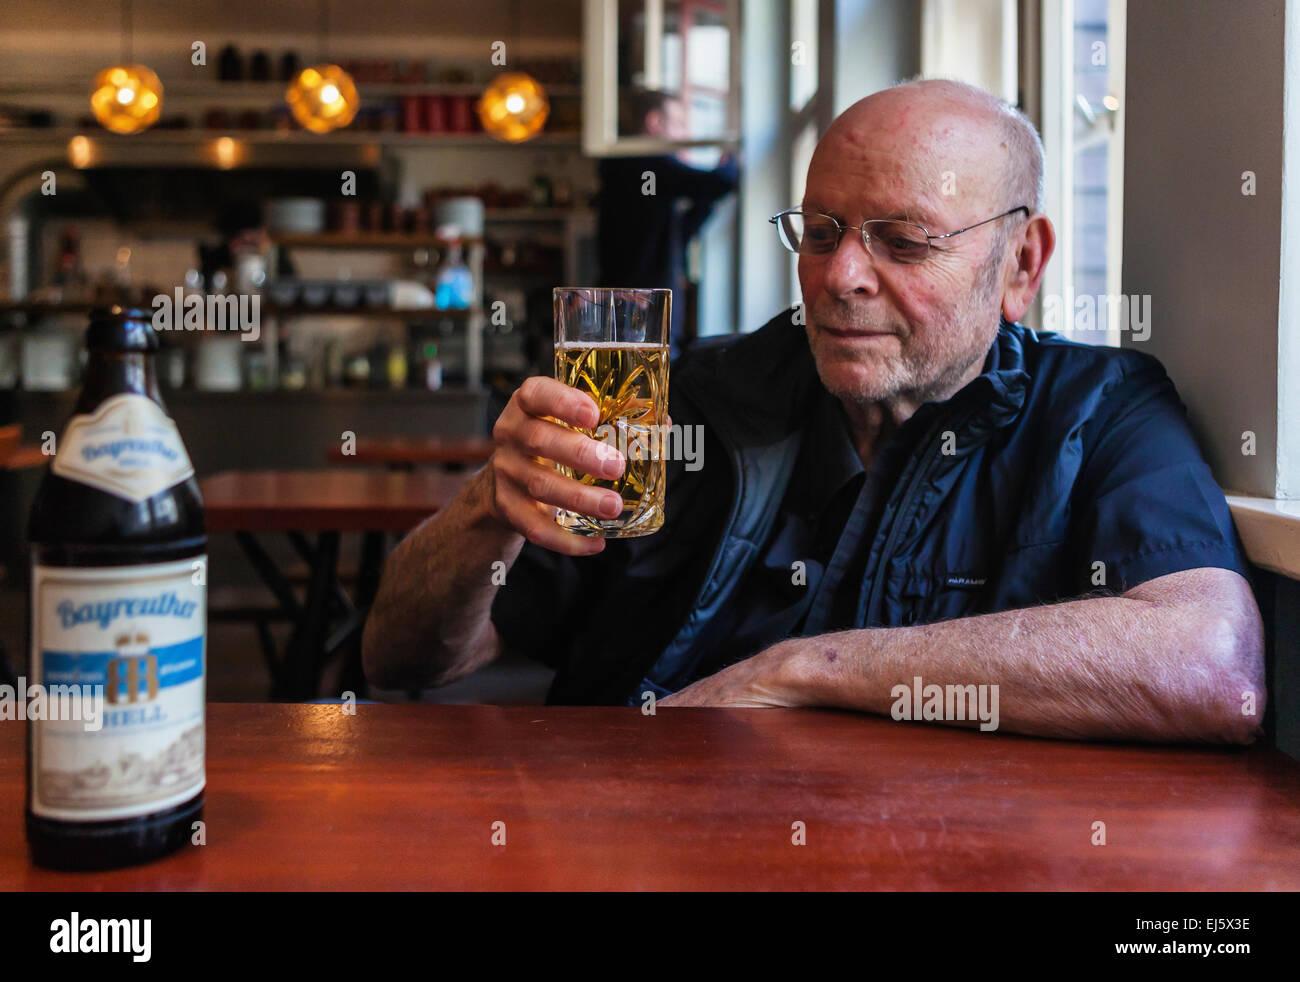 Elderly senior man drinking German beer in Mogg and Melzer restaurant interior, Auguststrasse, Mitte, Berlin - Stock Image